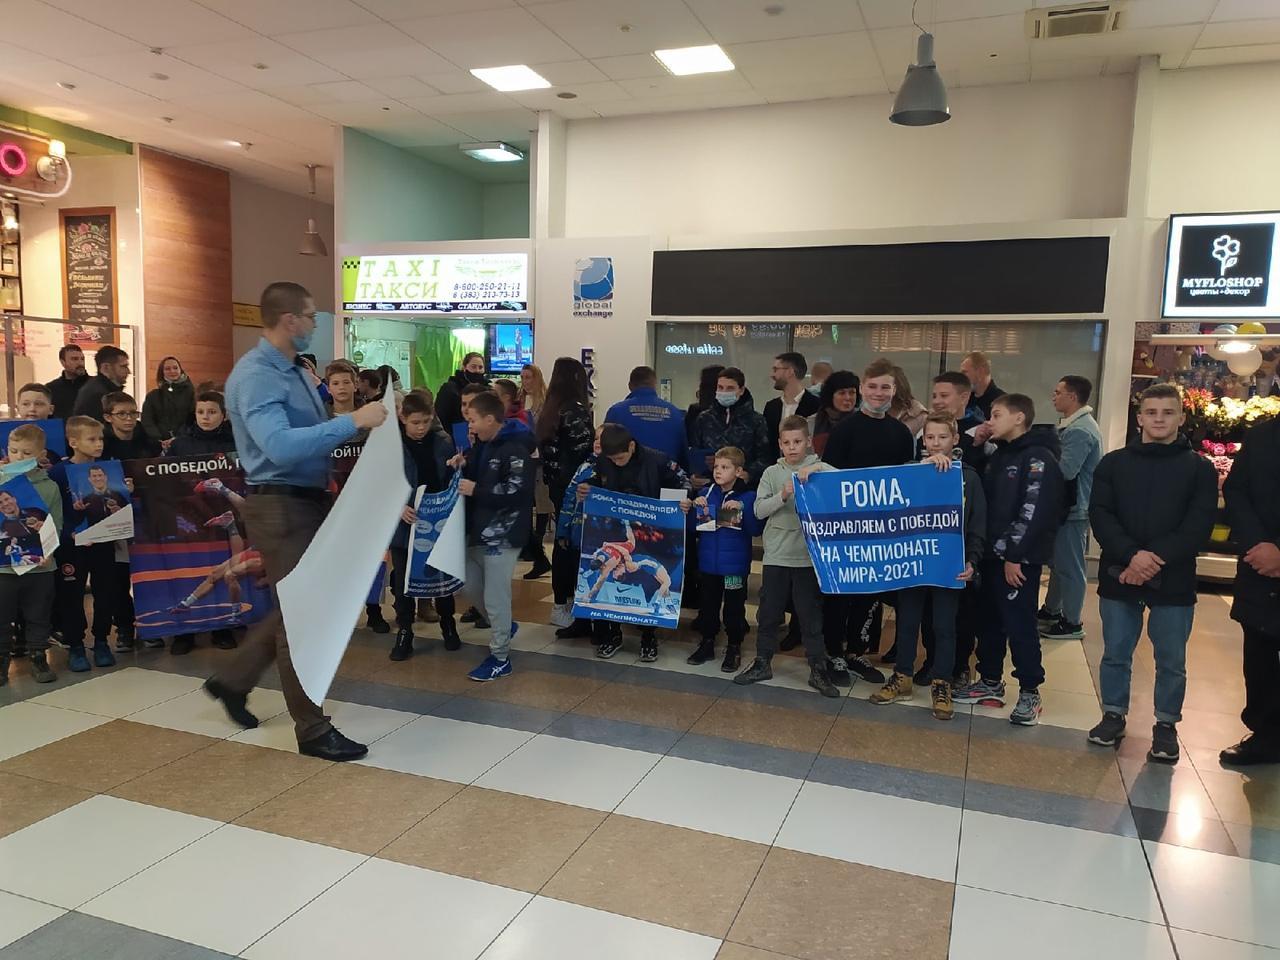 Фото Чемпион мира по борьбе Роман Власов прилетел в Новосибирск 3